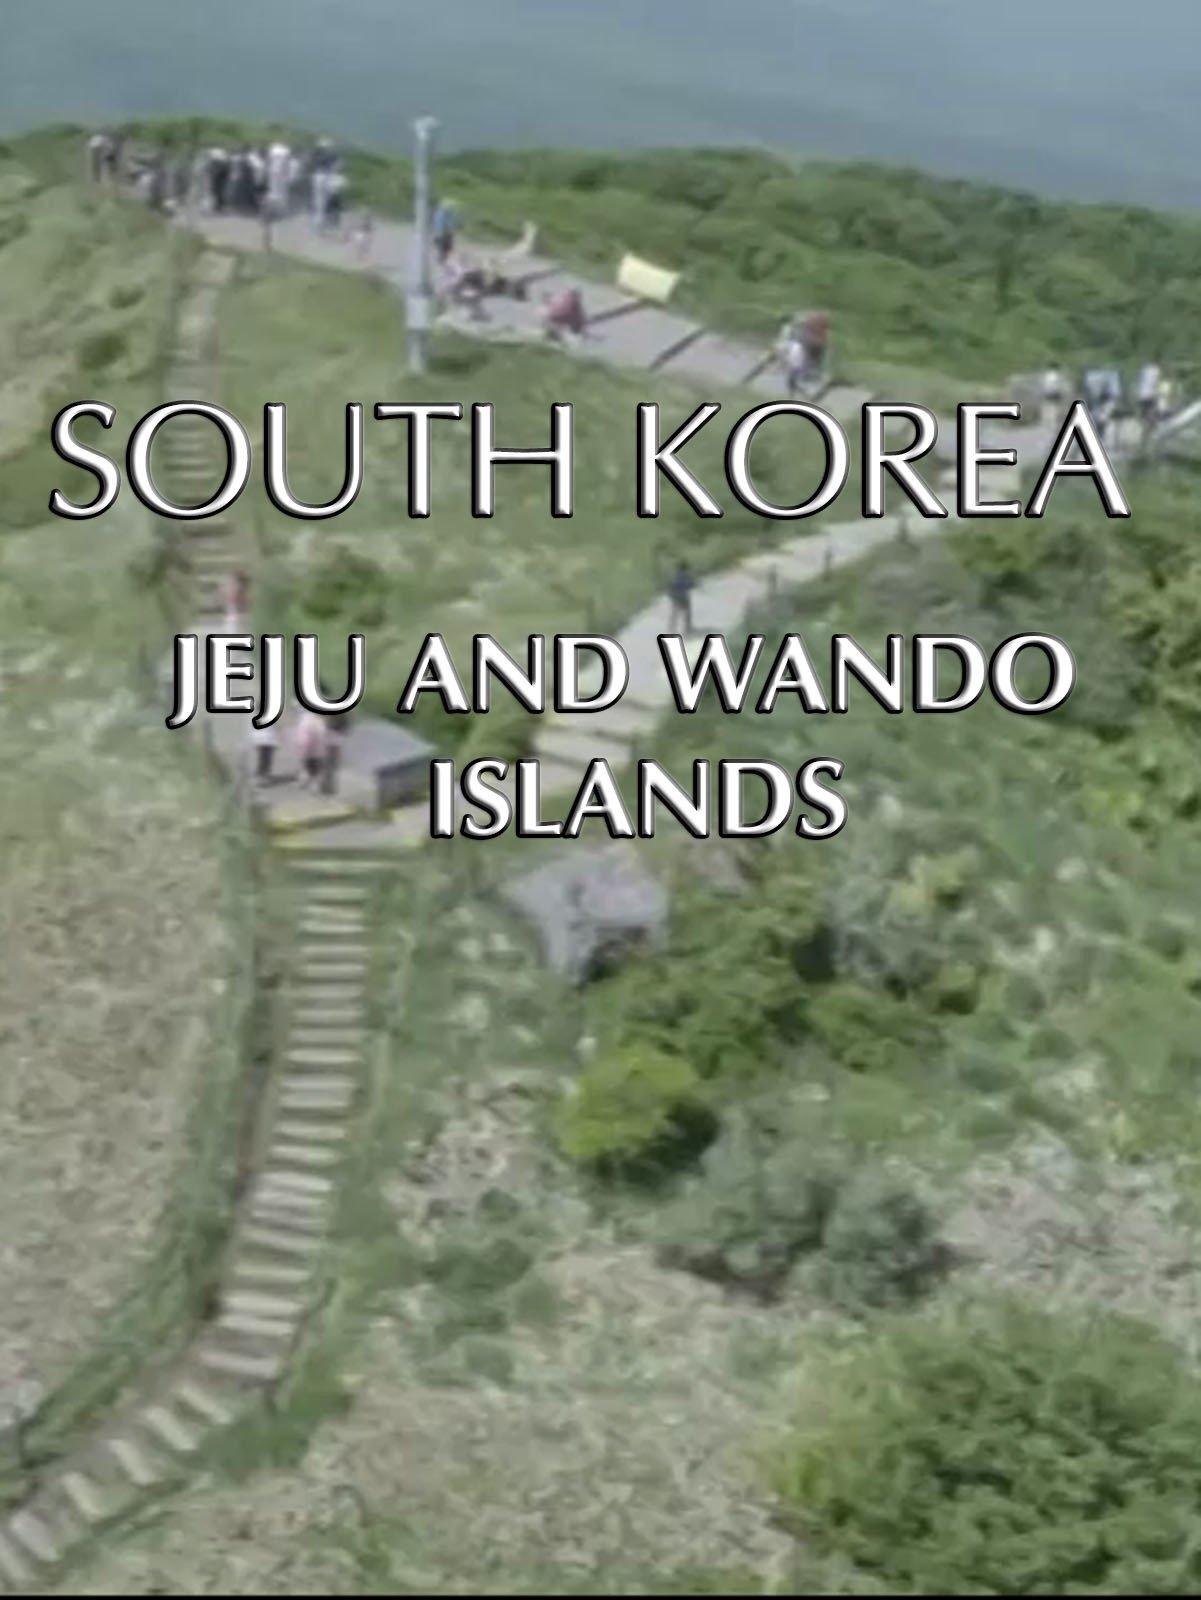 South Korea: Jeju and Wando islands on Amazon Prime Video UK